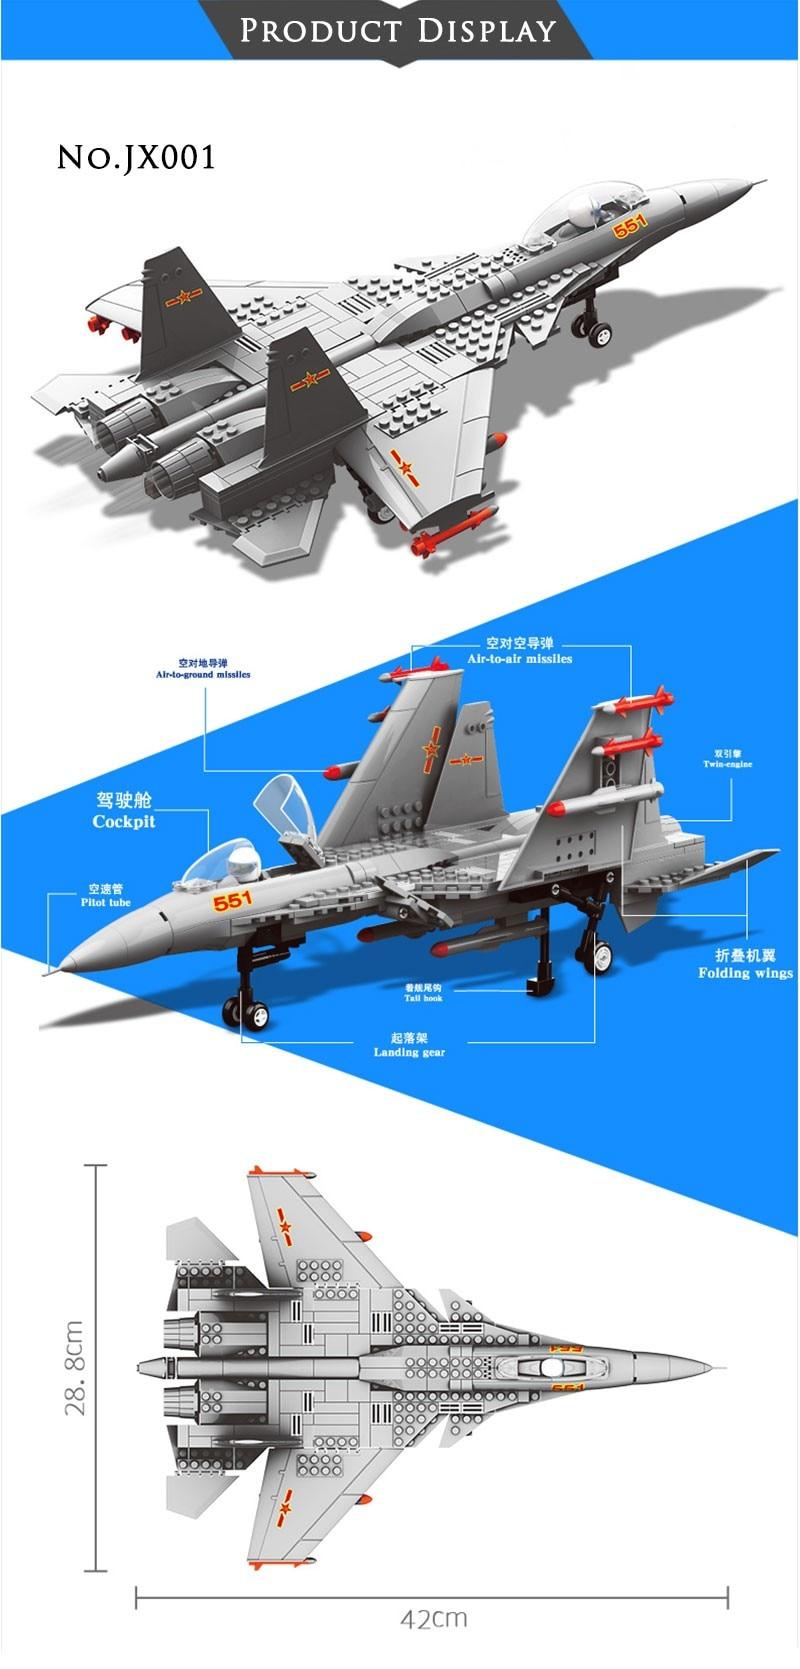 Wange Building Blocks Military F15 Fighter J-15 V-22 Osprey Tiltrotor Aircraft Helicopter Model Building Kits Toys For Children 1